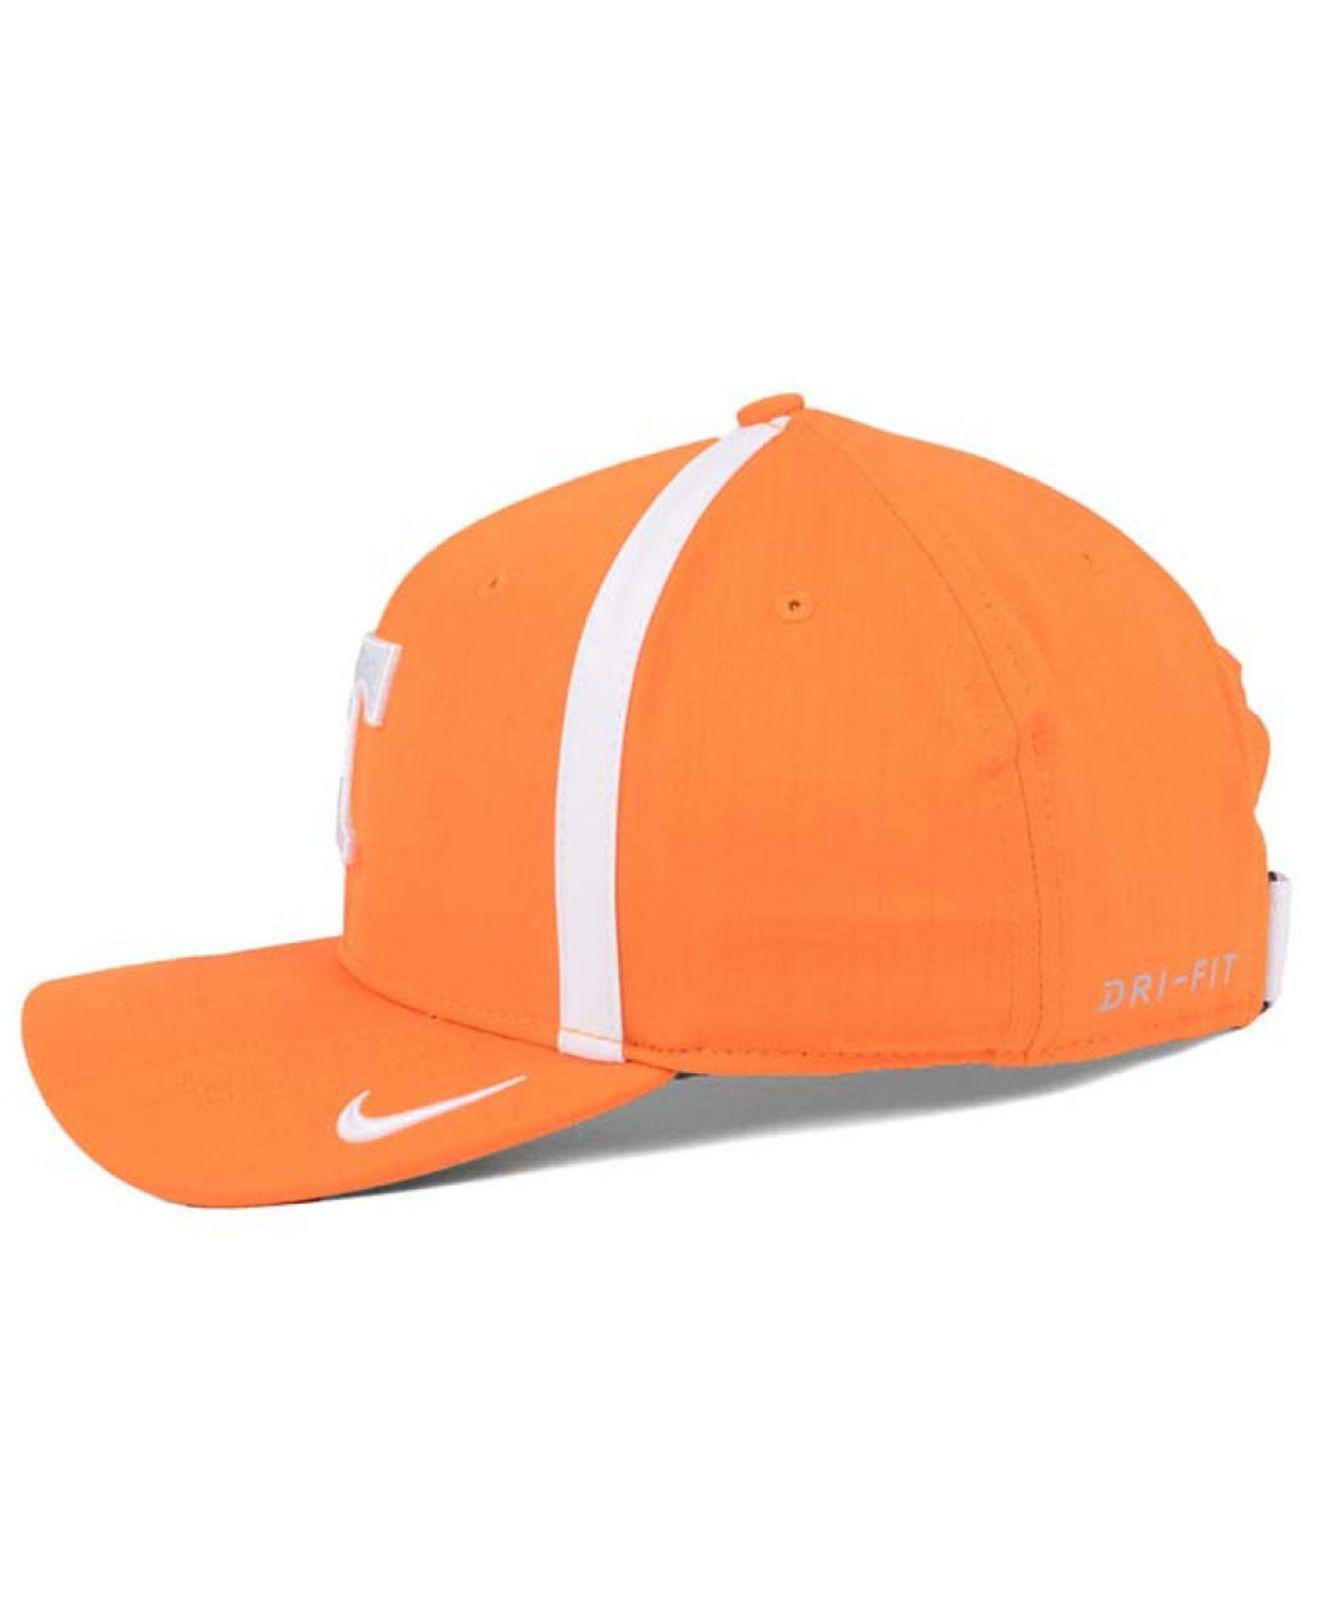 c08d776b88ffa ... official lyst nike aerobill sideline coaches cap in orange for men  291e9 978b9